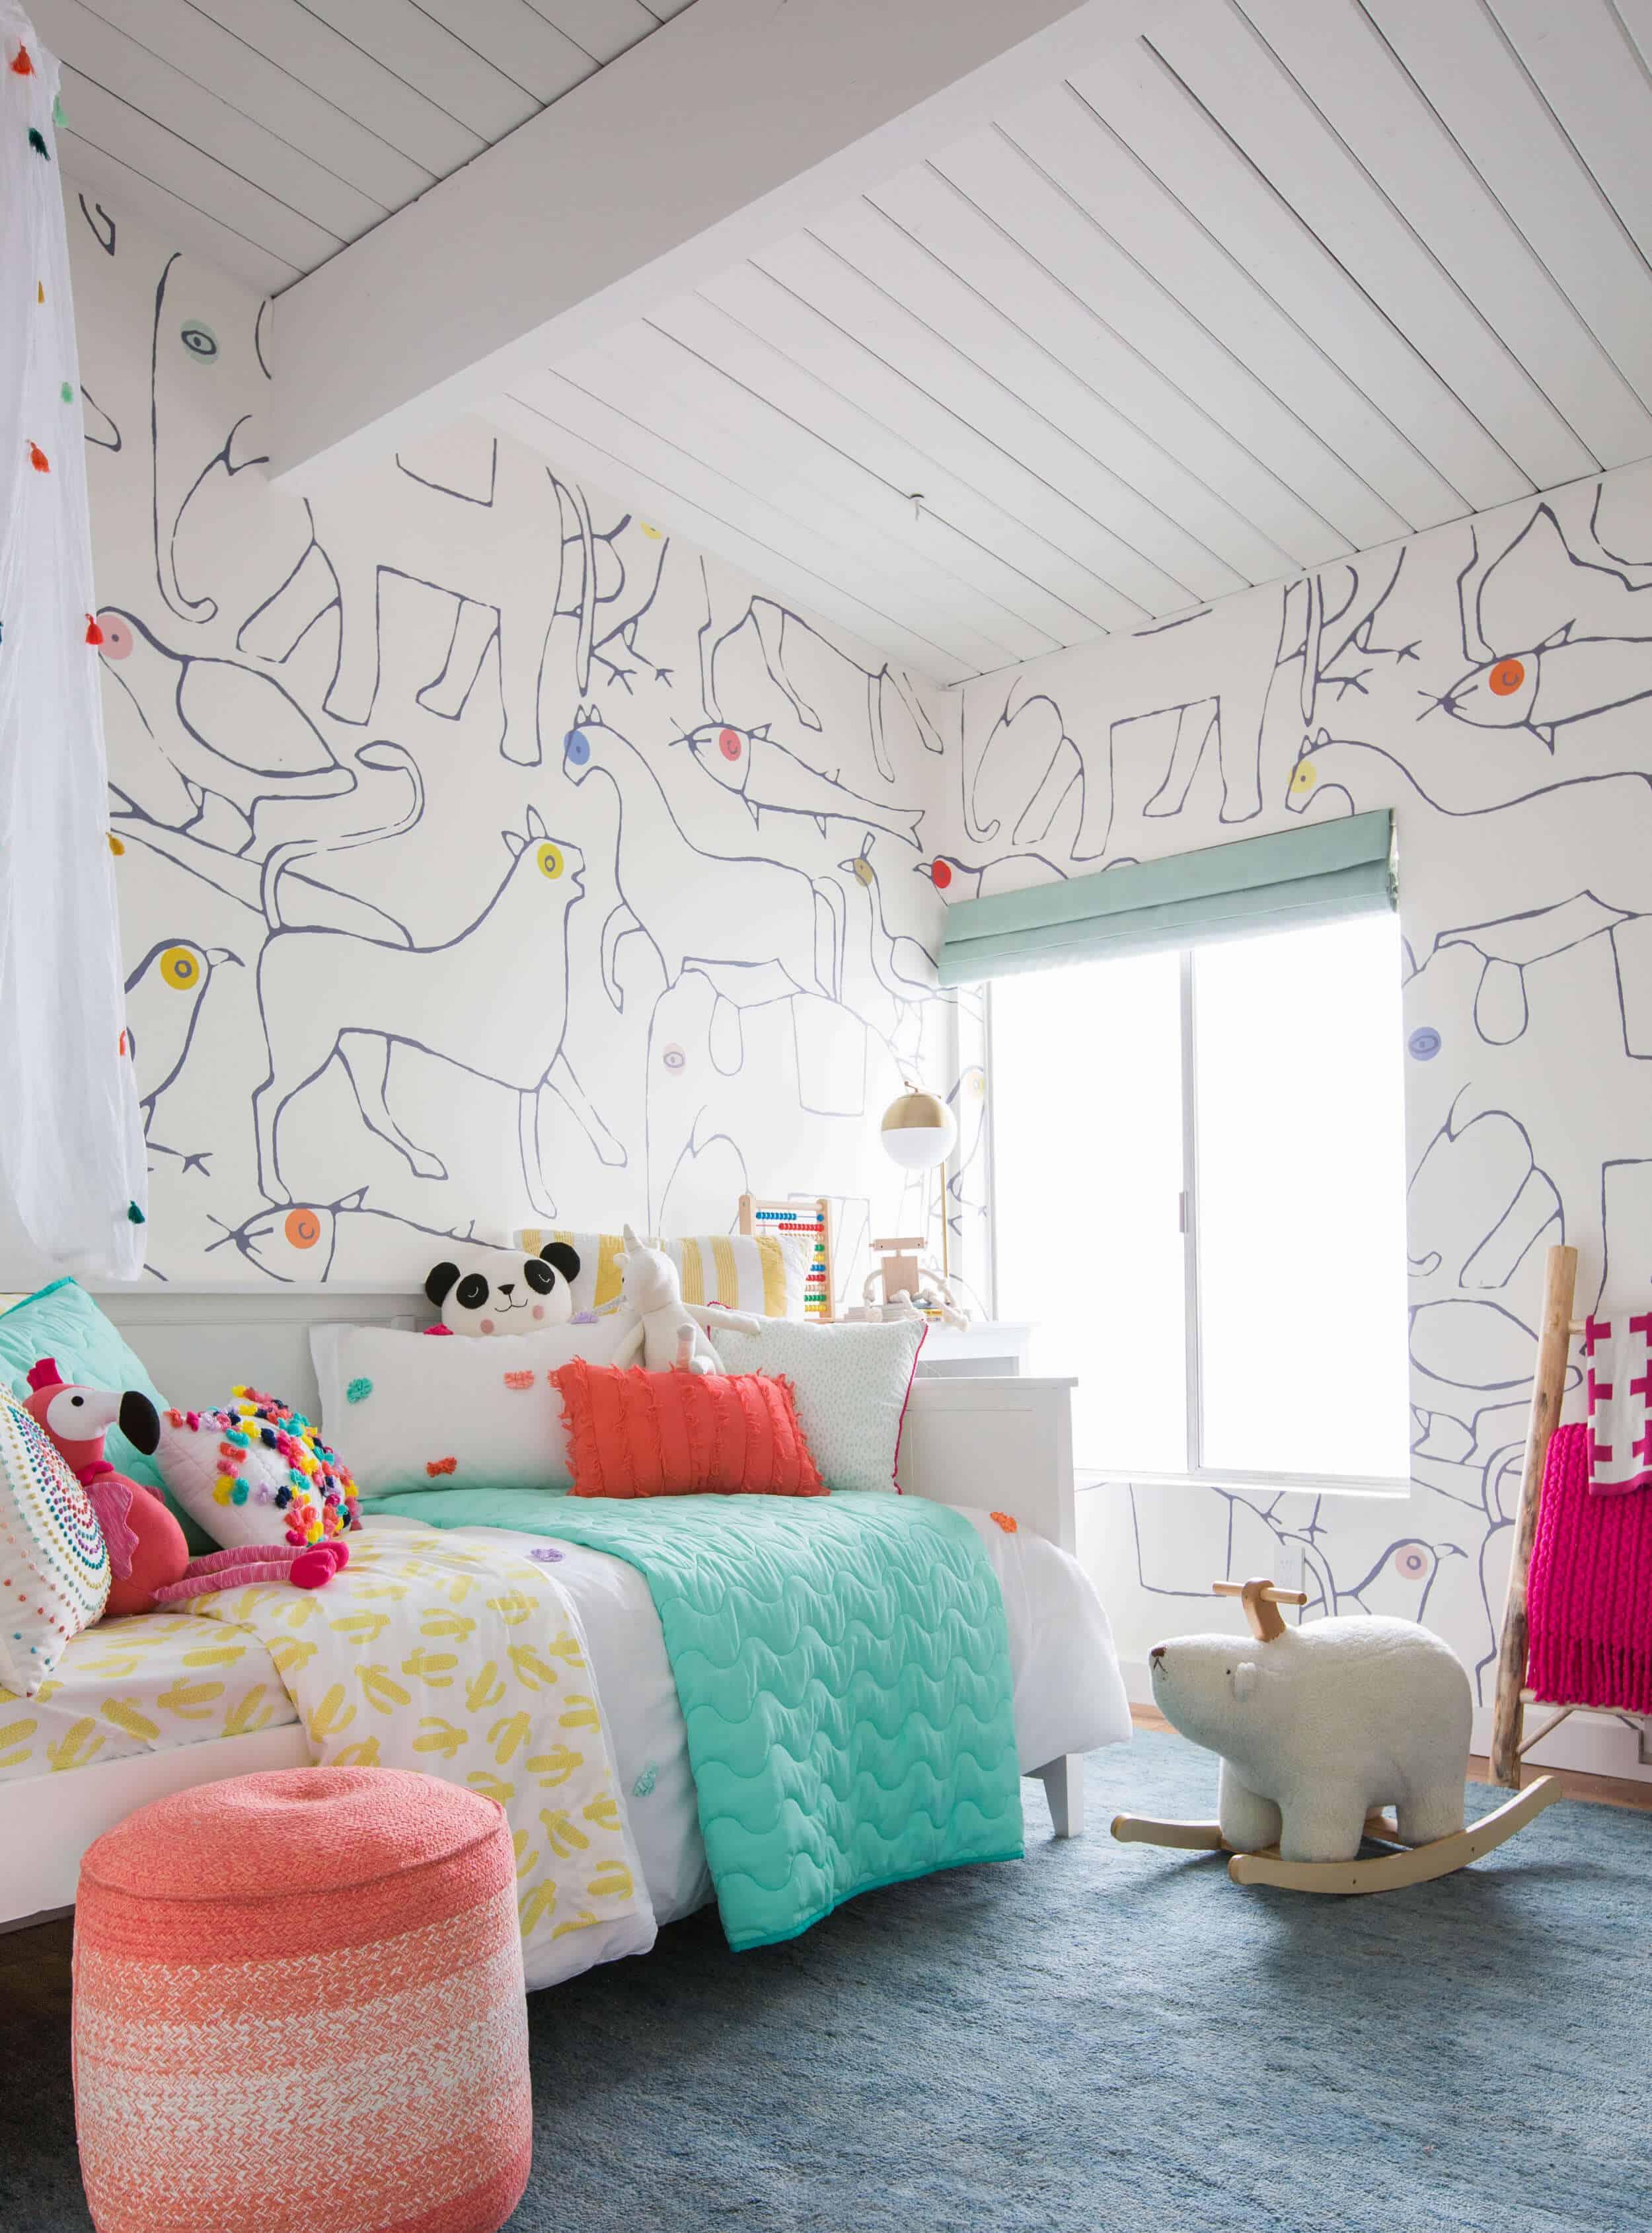 Emily Henderson_Kids Room_Target_Bedding_Layered_Light_Texture_Blue_White_Brass_Nursery_Girls Room_Bright_4